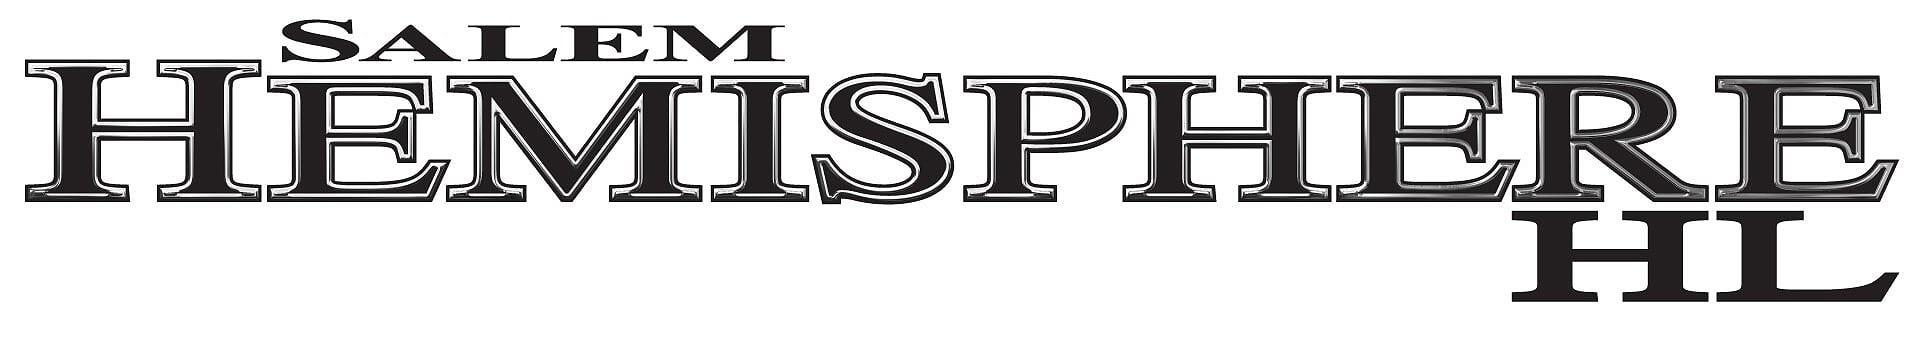 Salem Hemisphere Hyper Lite Travel Trailer Logo